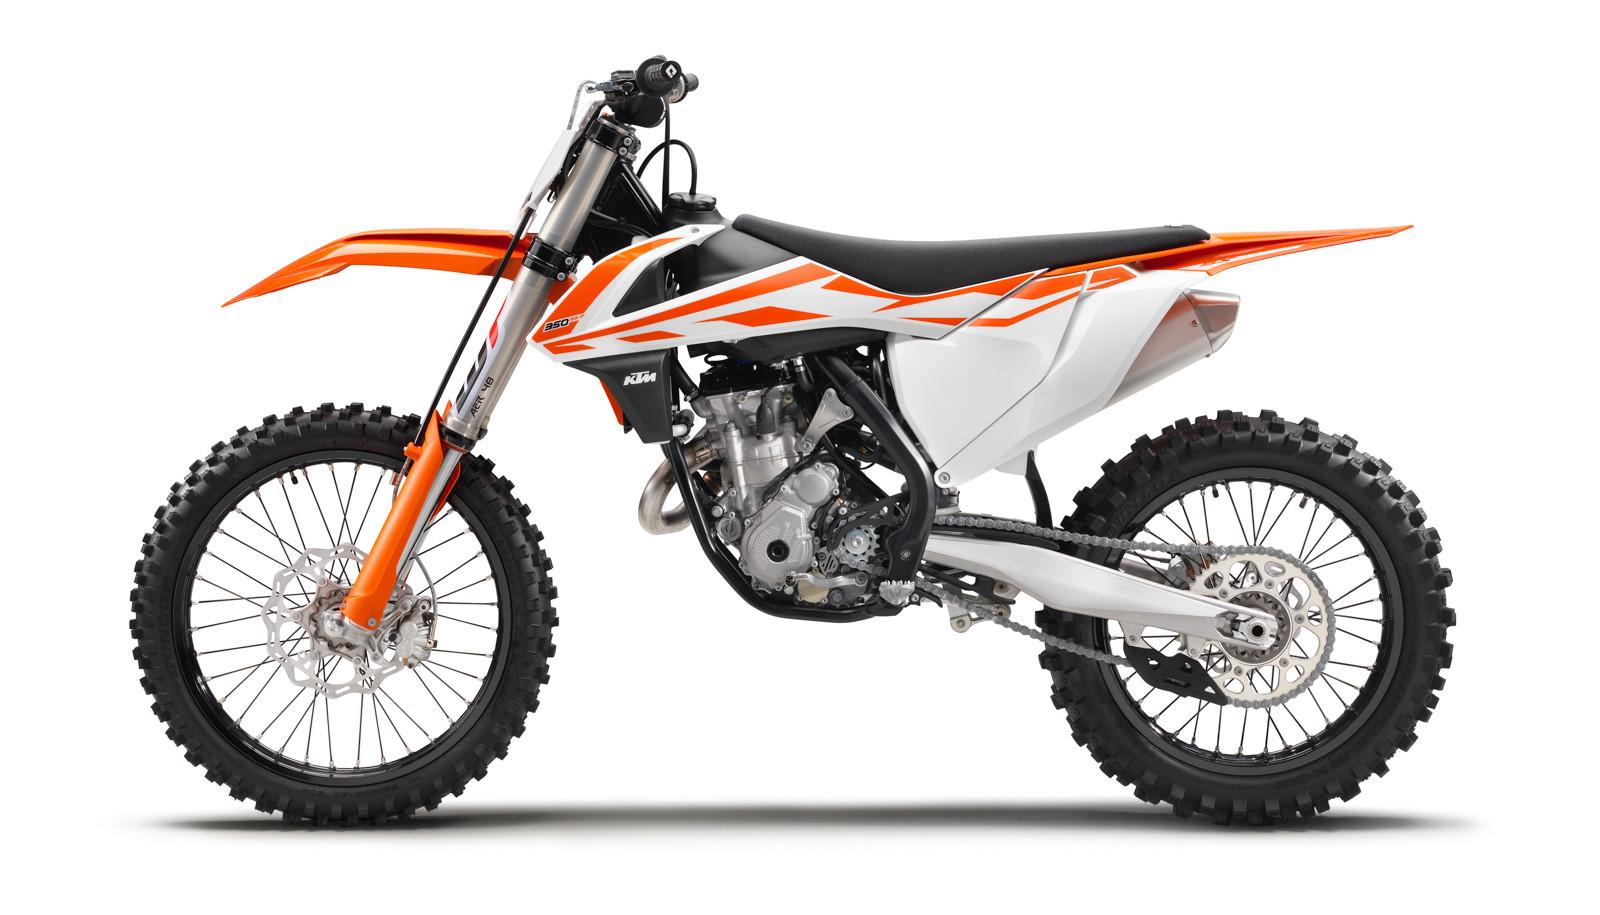 2017 ktm 350 sx-f - first look: 2017 ktm motocross and cross